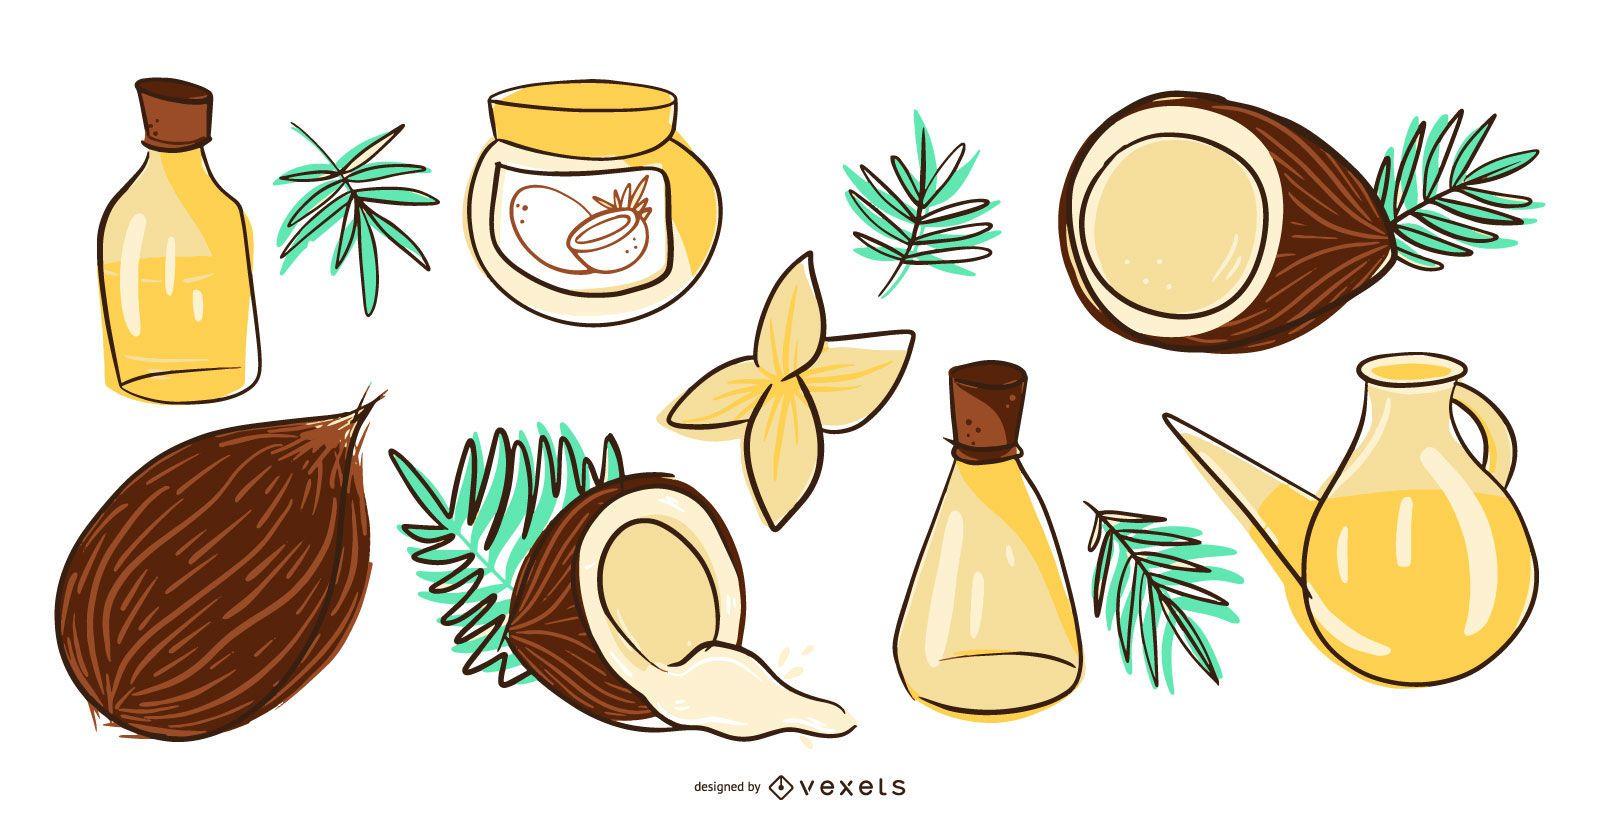 Coconut products illustration set